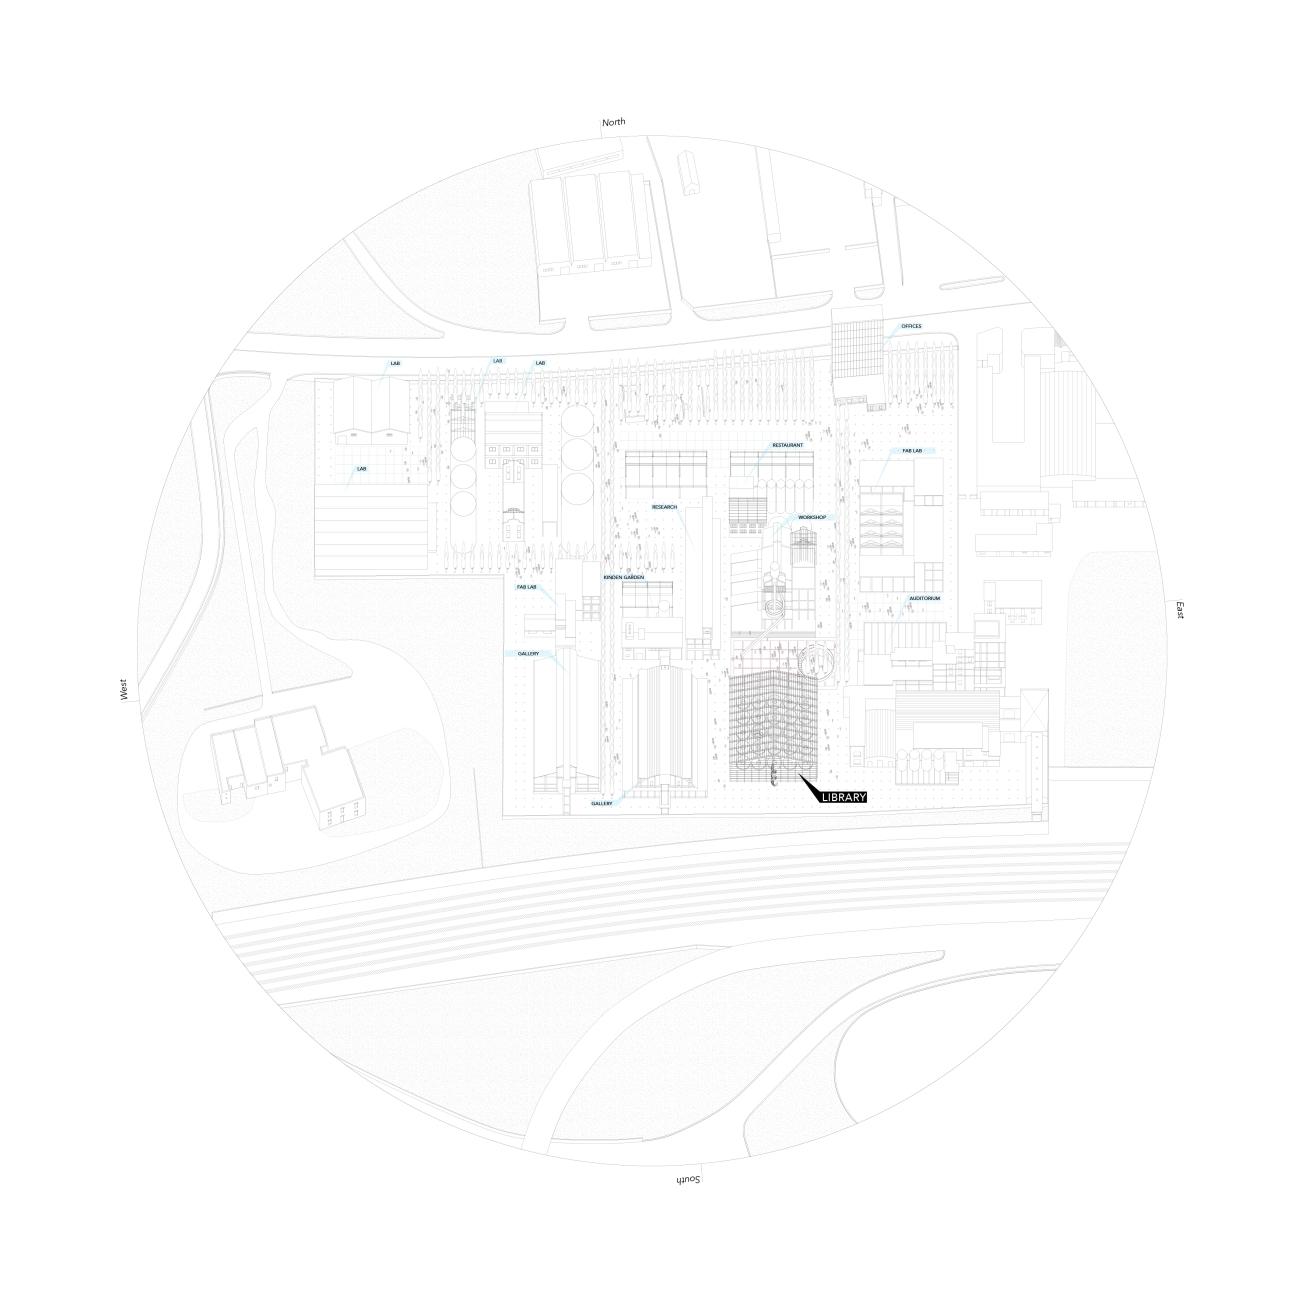 Library Masterplan,Pierluigi Bardi Benedetta De Mitri, Academic